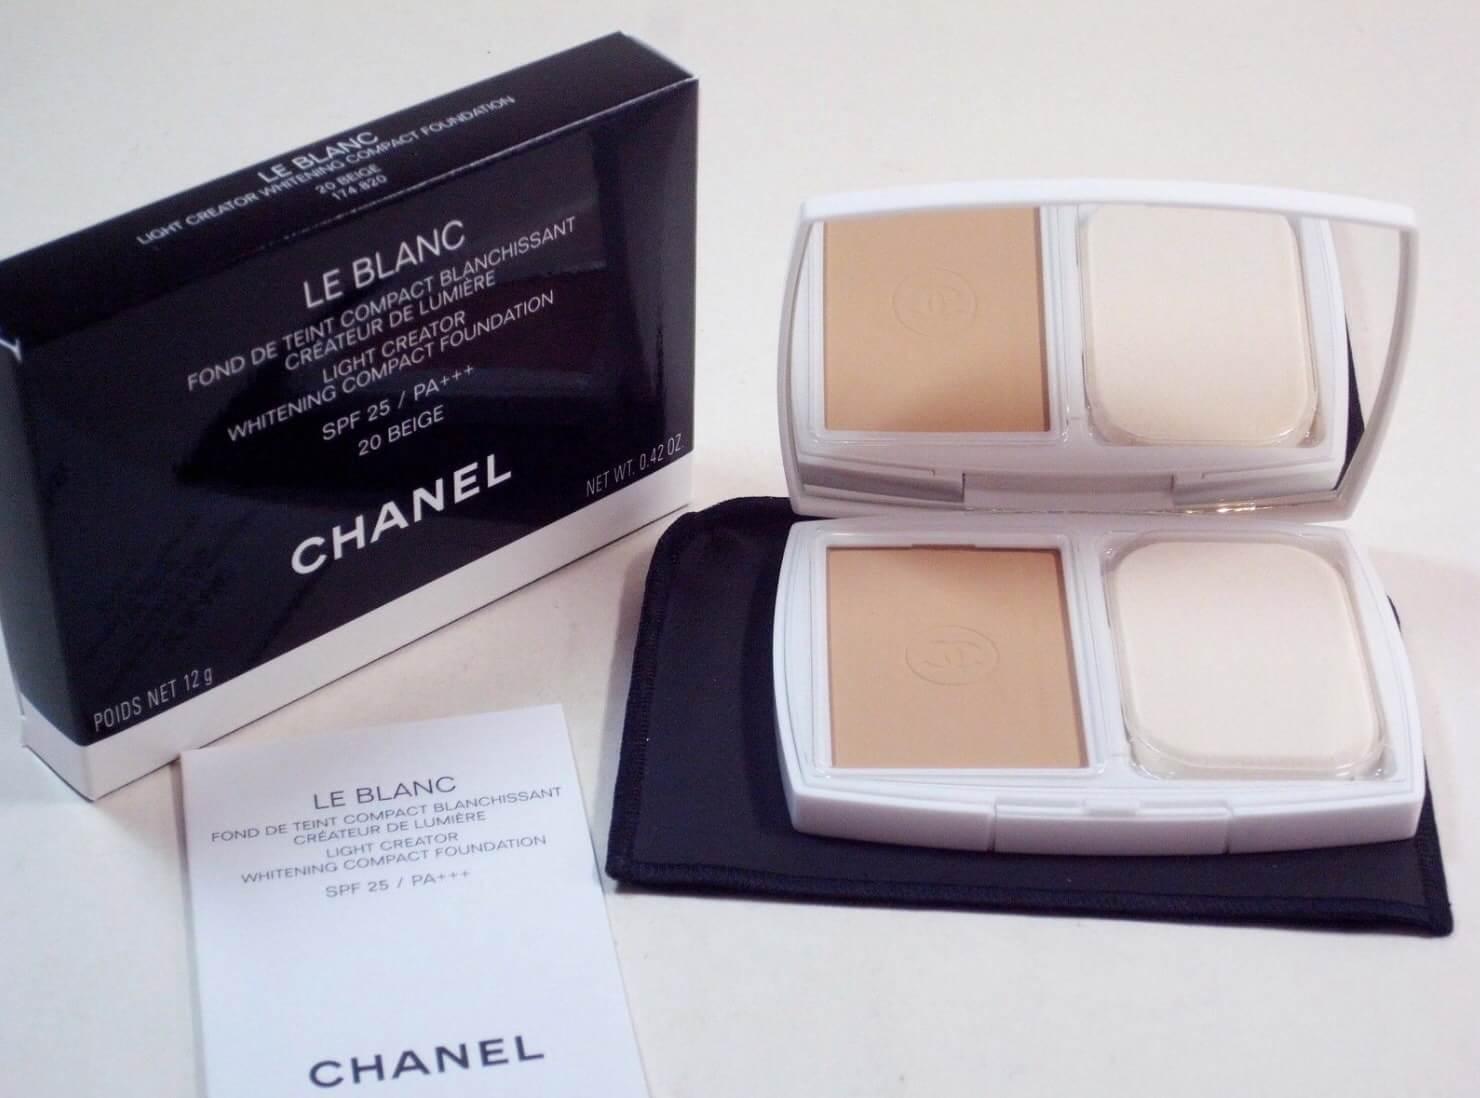 Chanel Le Blanc Light Creator Whitening Compact Foundation SPF 25 / PA+++ 12g